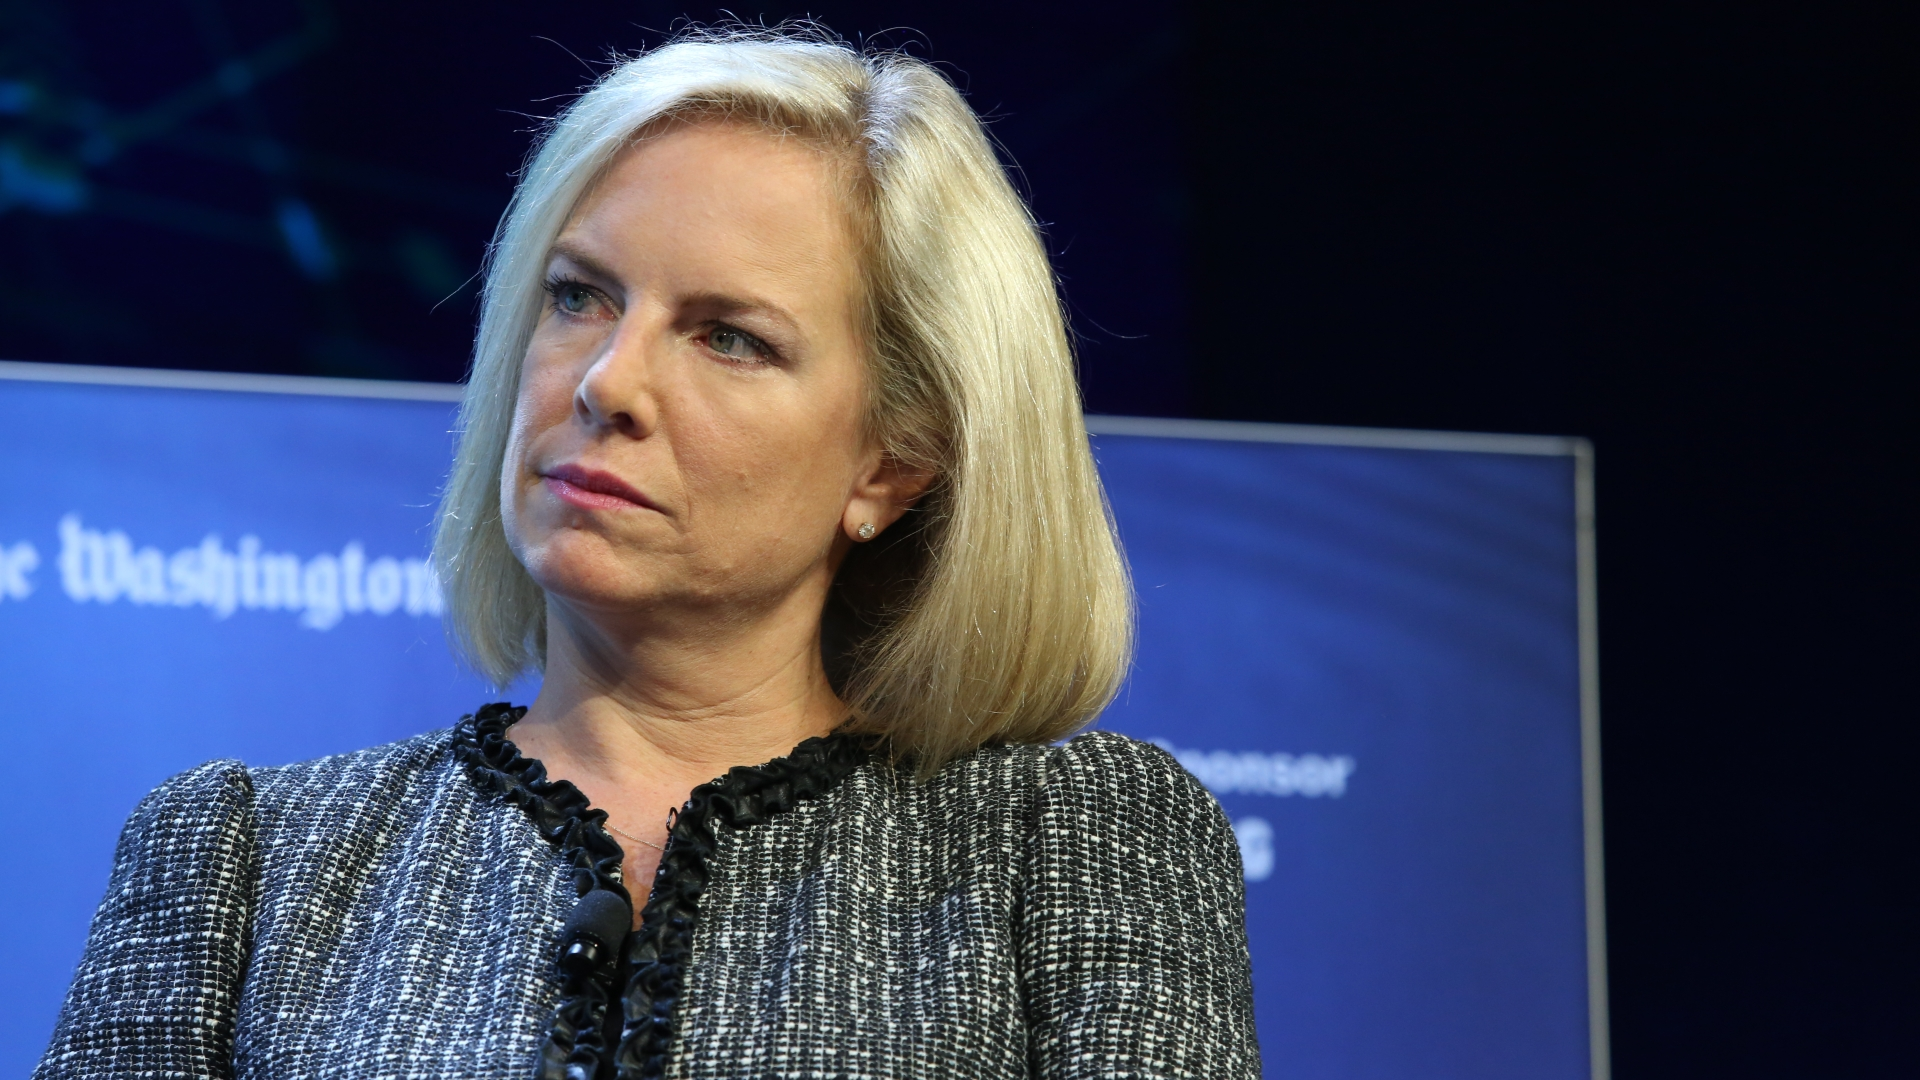 Trump is preparing to remove Kirstjen Nielsen as Homeland Security secretary, aides say